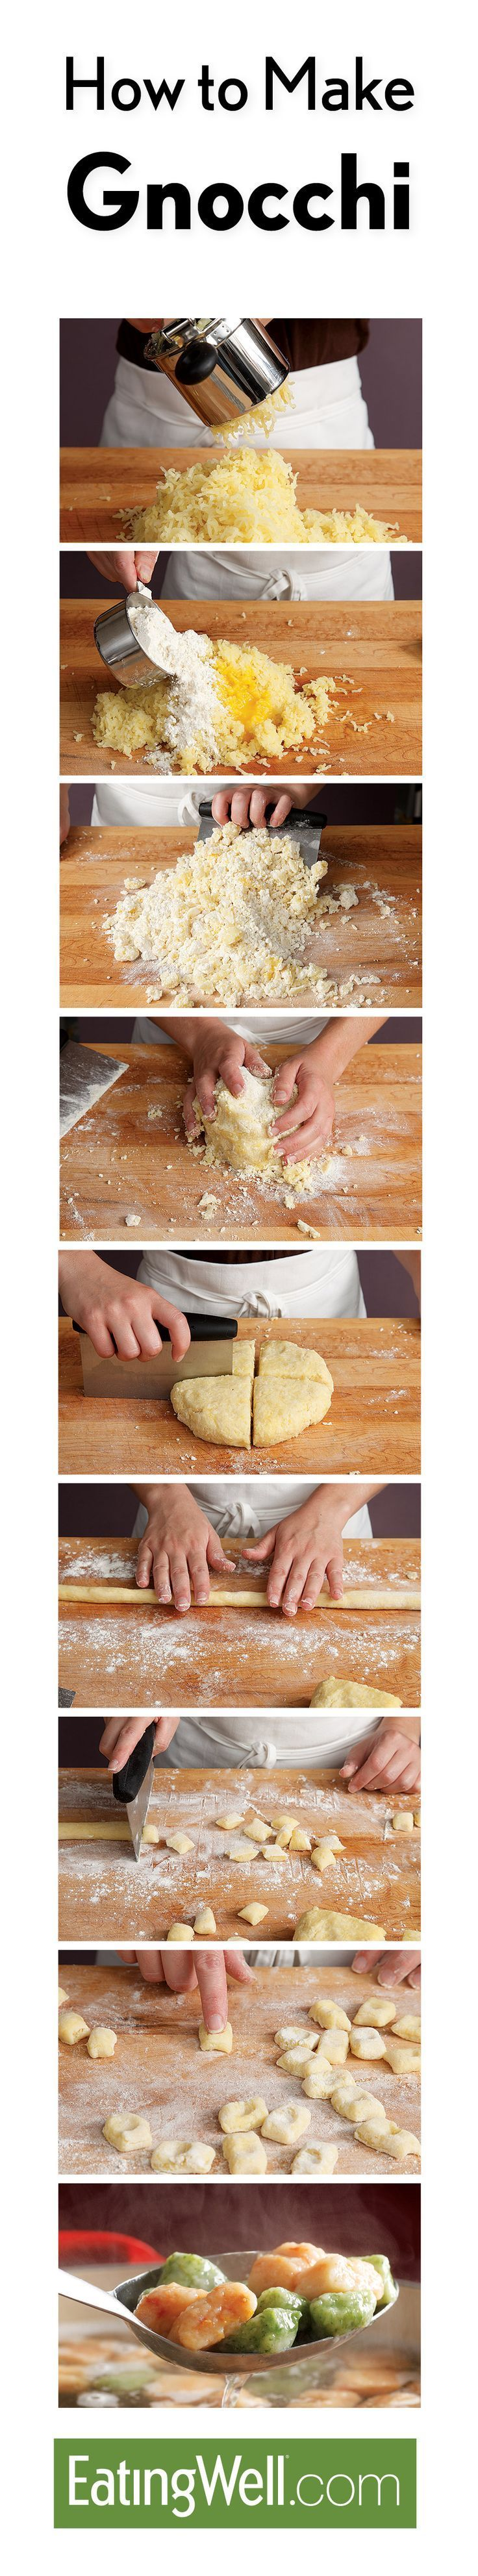 Easy, healthy, homemade gnocchi